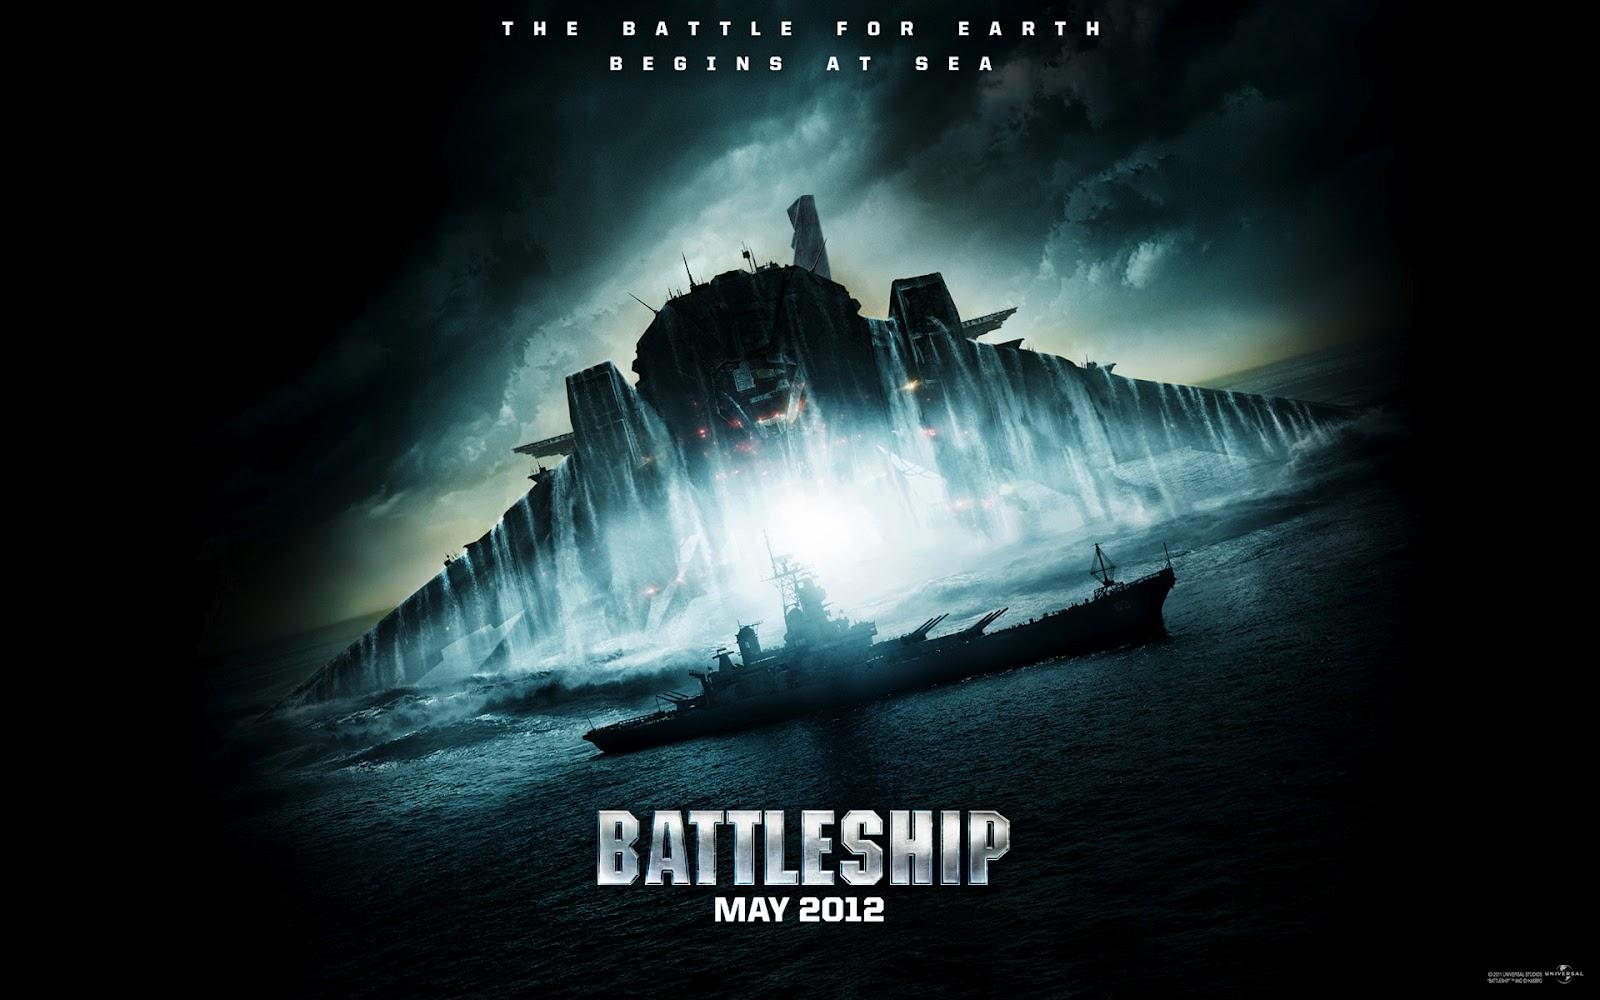 http://1.bp.blogspot.com/-CpoNM9tcjHI/T4Kut80jRiI/AAAAAAAABNA/IL_fc4X2v28/s1600/Battleship_2012_Movie_HD_Wallpaper-Vvallpaper.Net.jpg